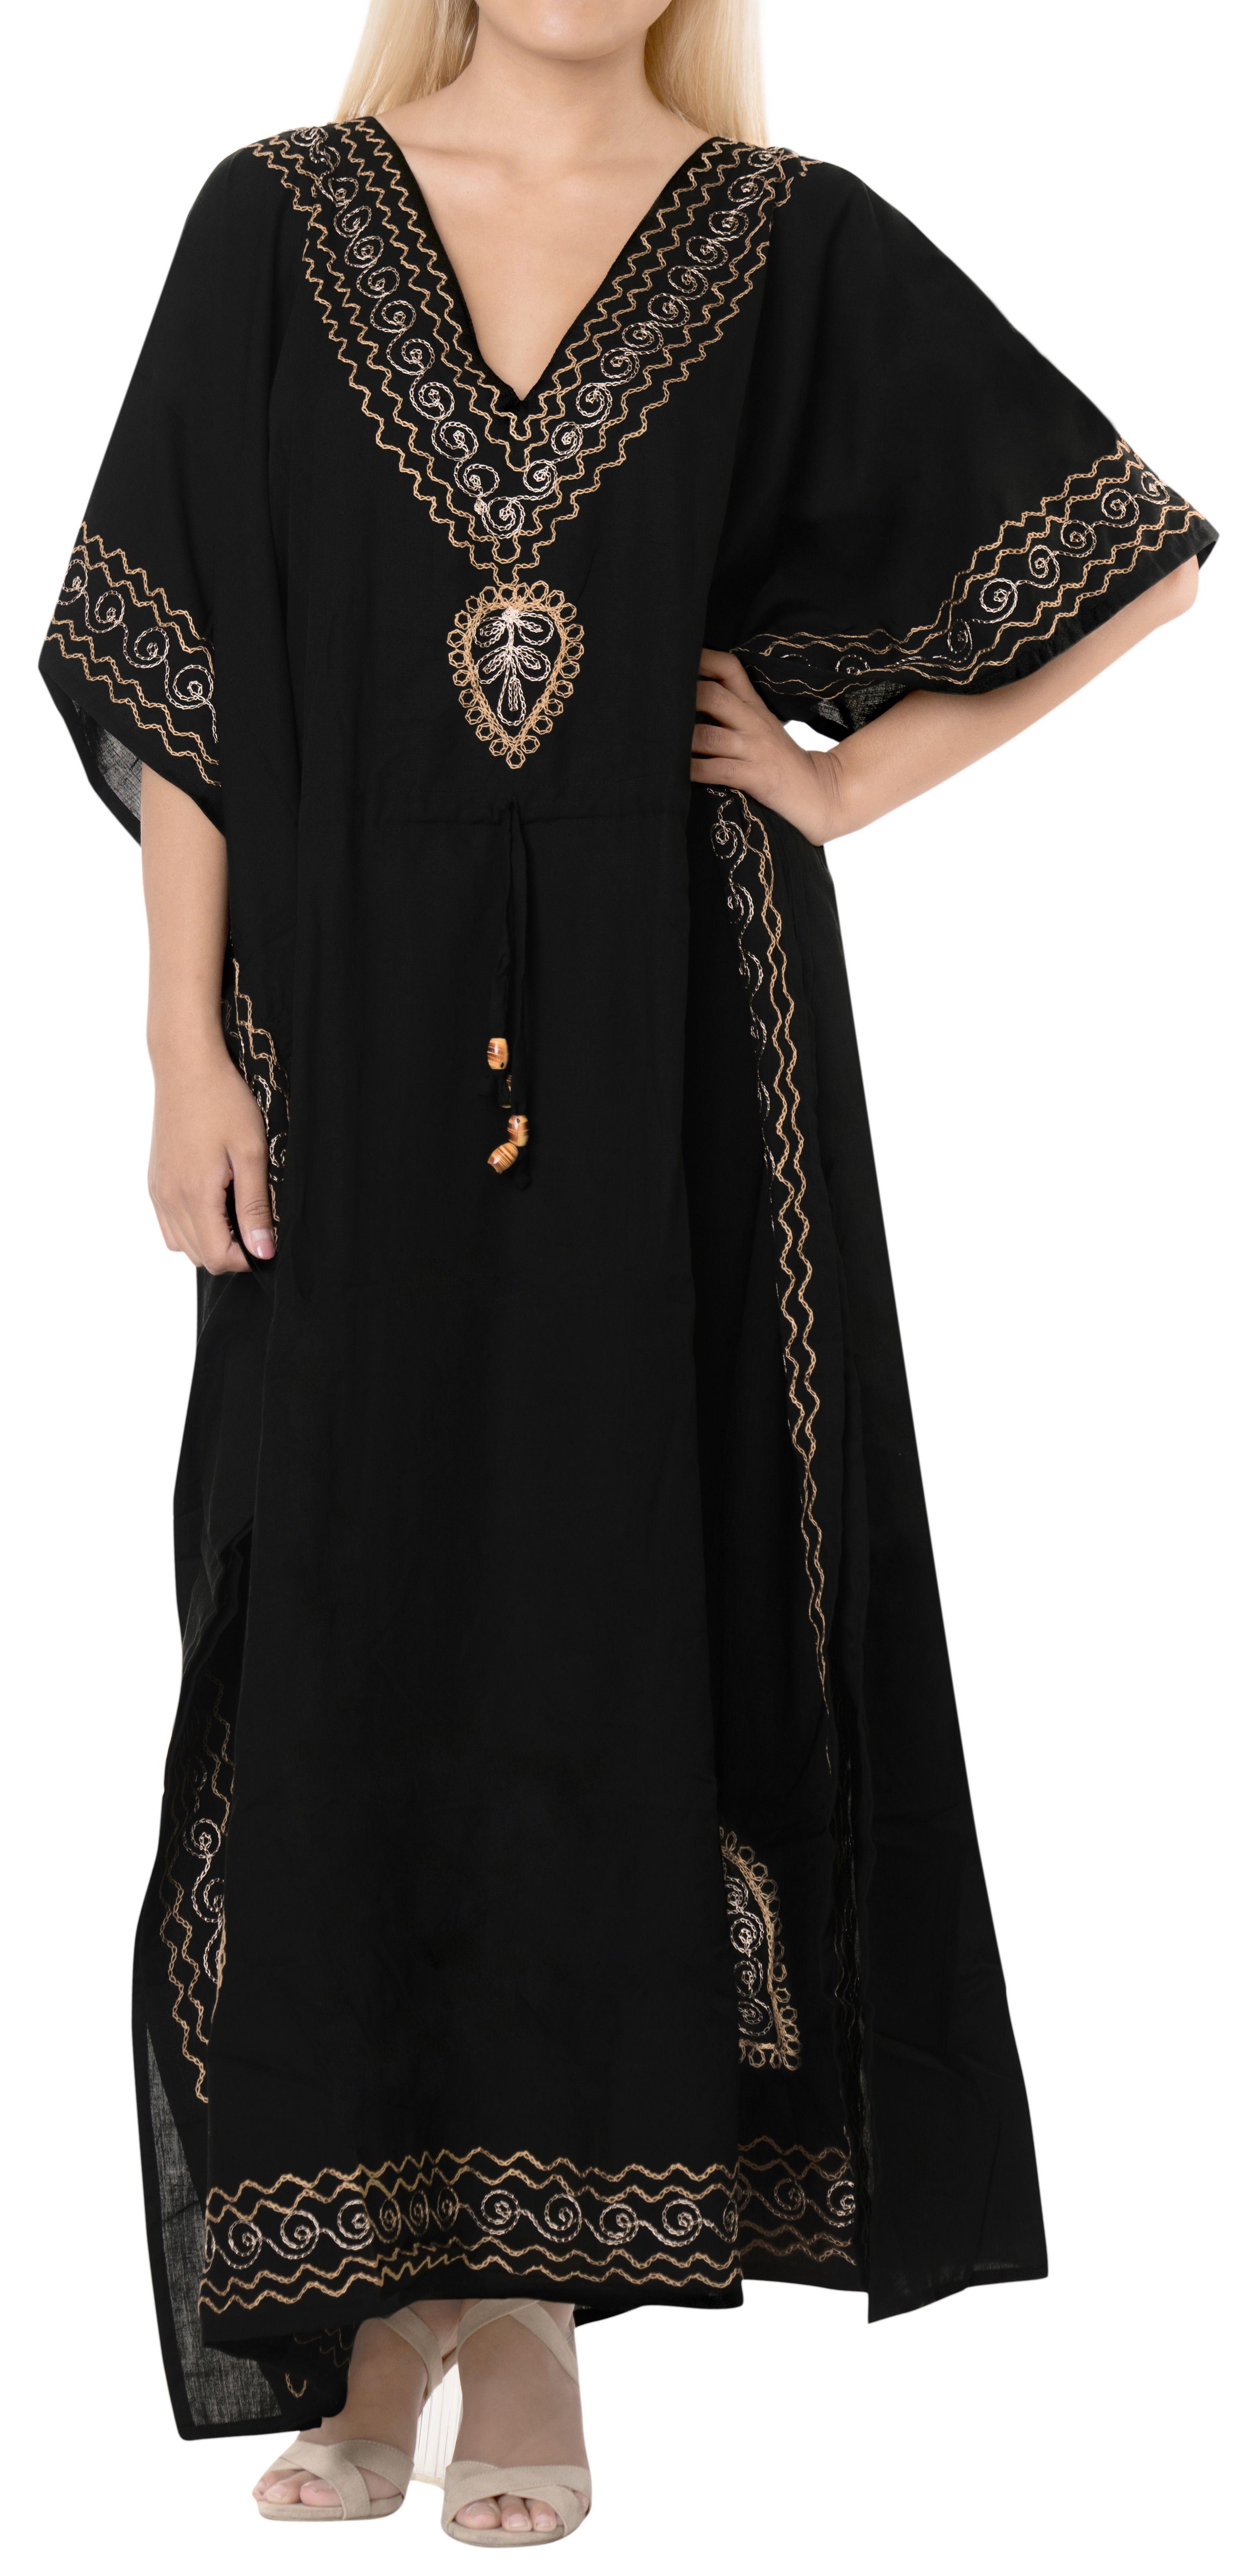 be3c80280c LA LEELA Women's Rayon plus Lounge Night Sleep Beach Caftan Long Dress  Black#Rayon, #Lounge, #Night